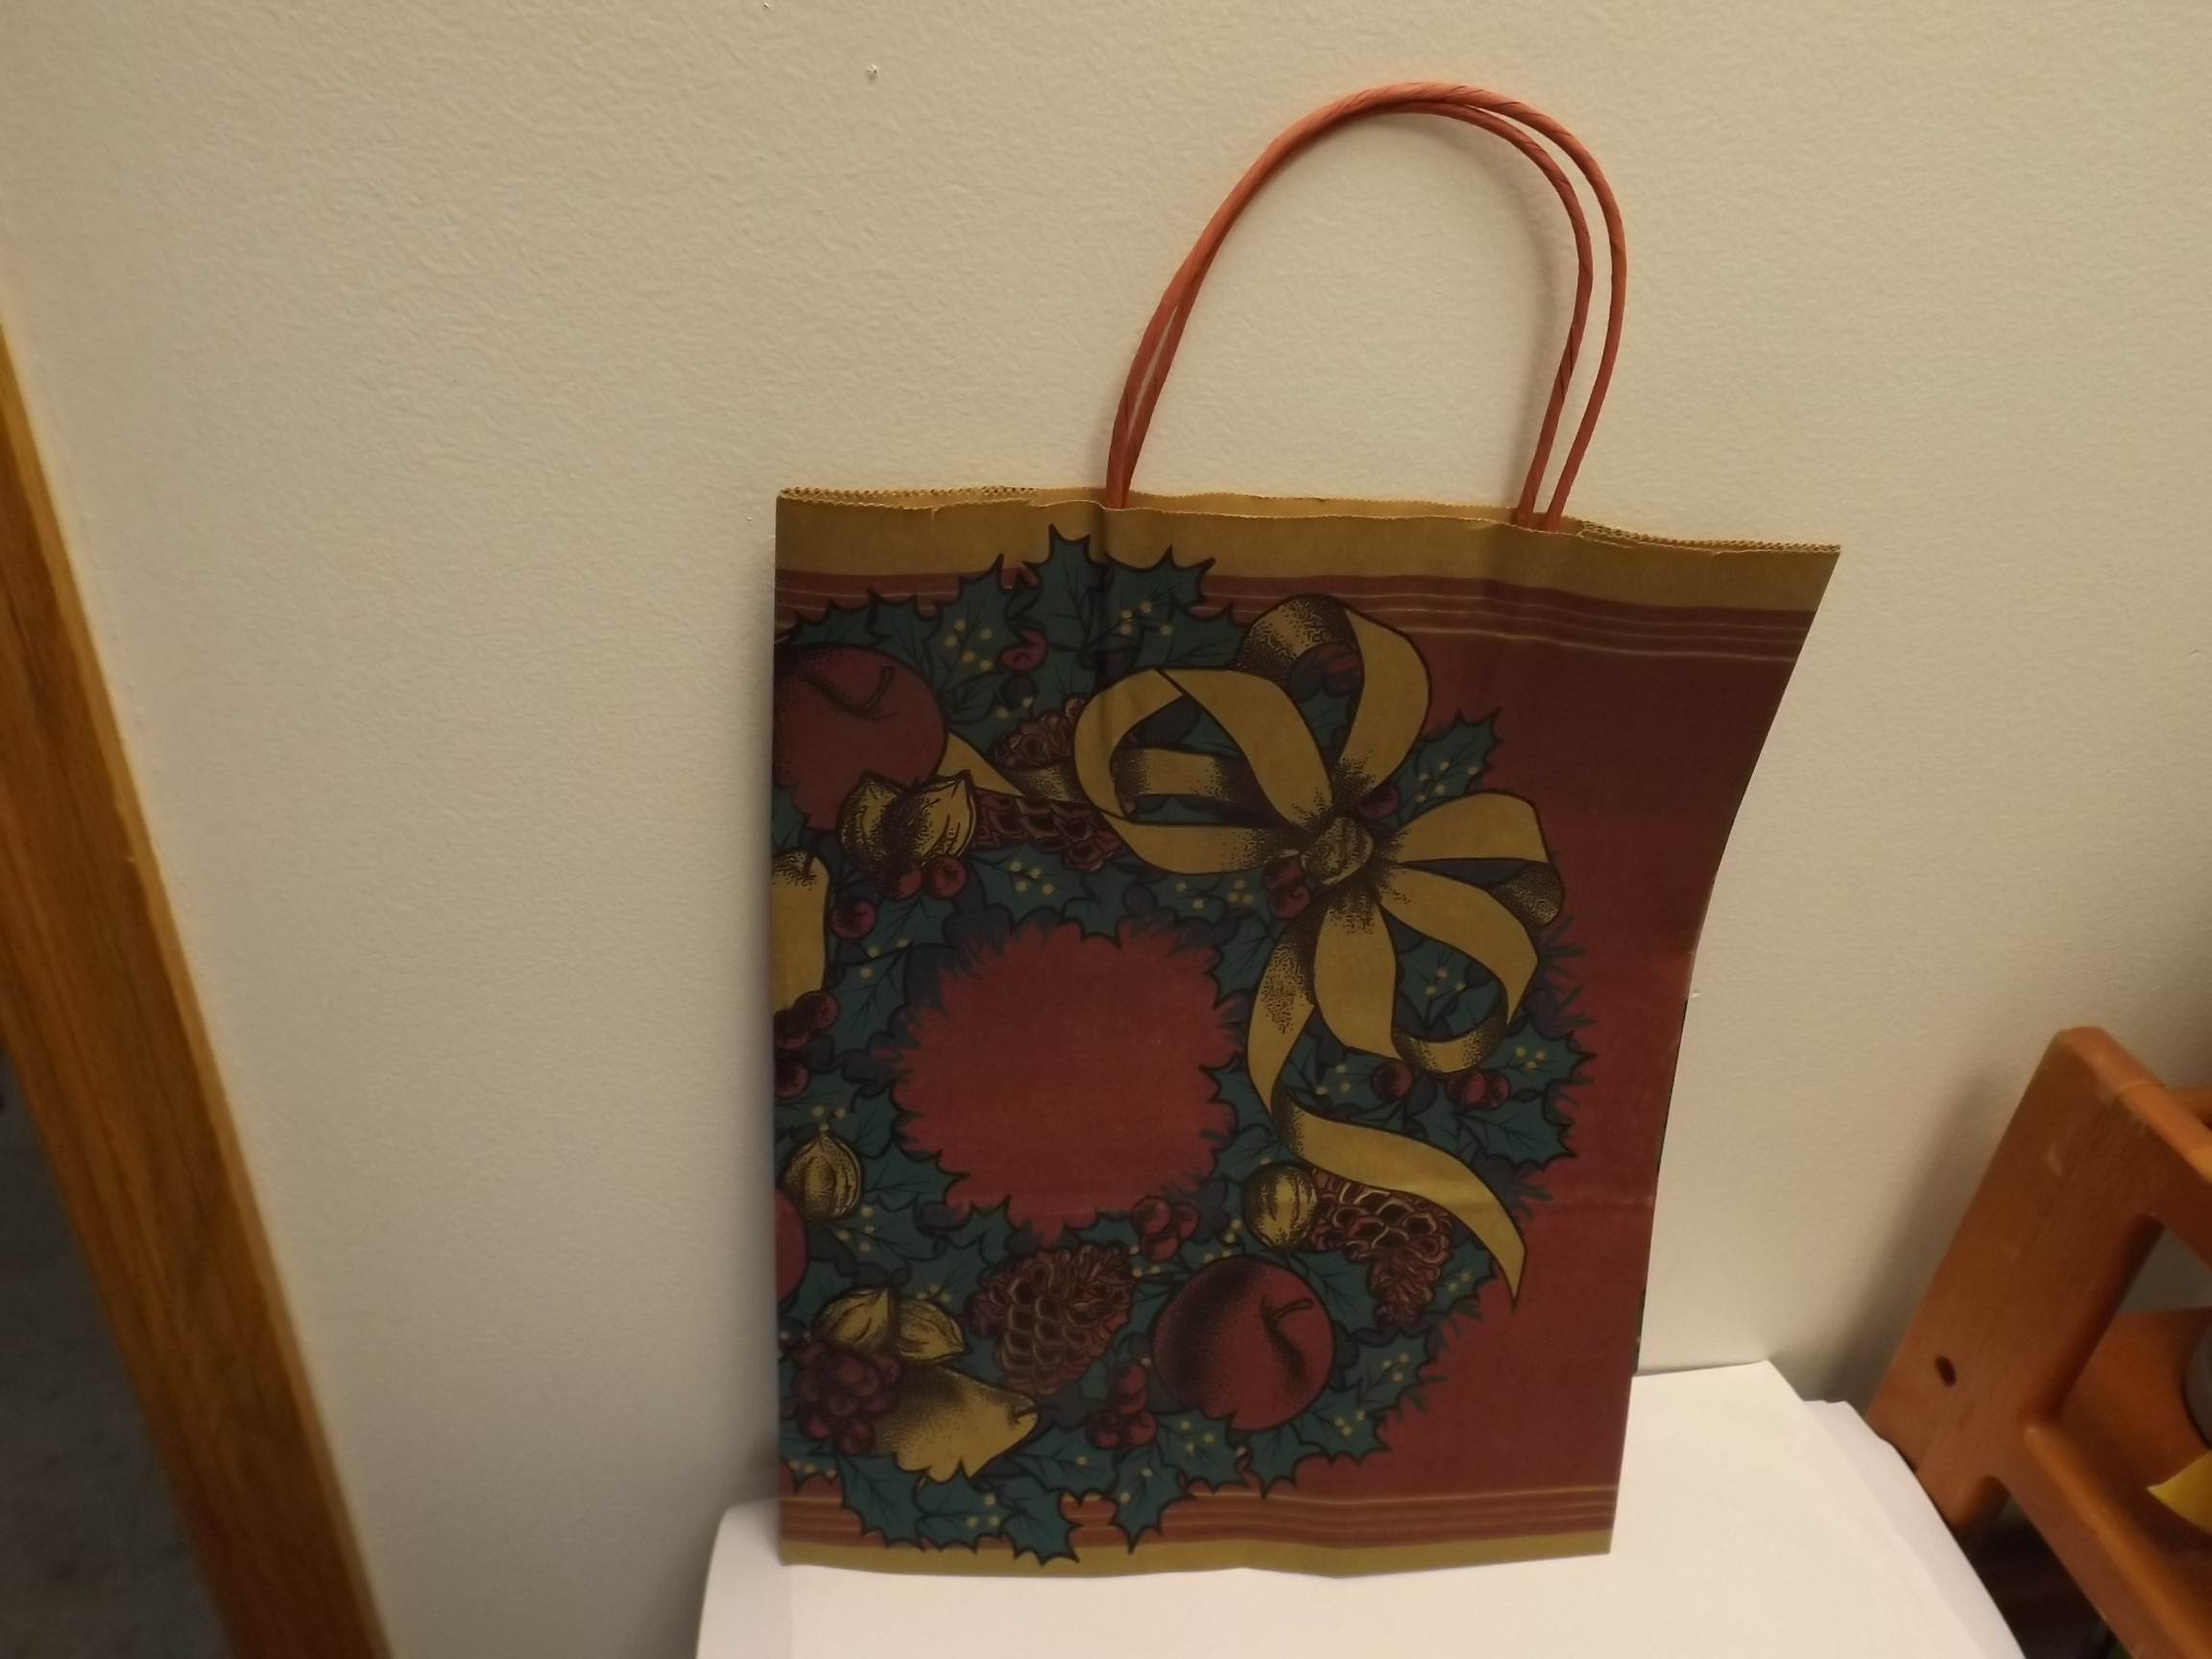 "GB610 ""Festive Wreath"" Gift Bags- Pkg of 50- 12 1/2"" x 15 1/2"" x 6"" - Limited Supply"